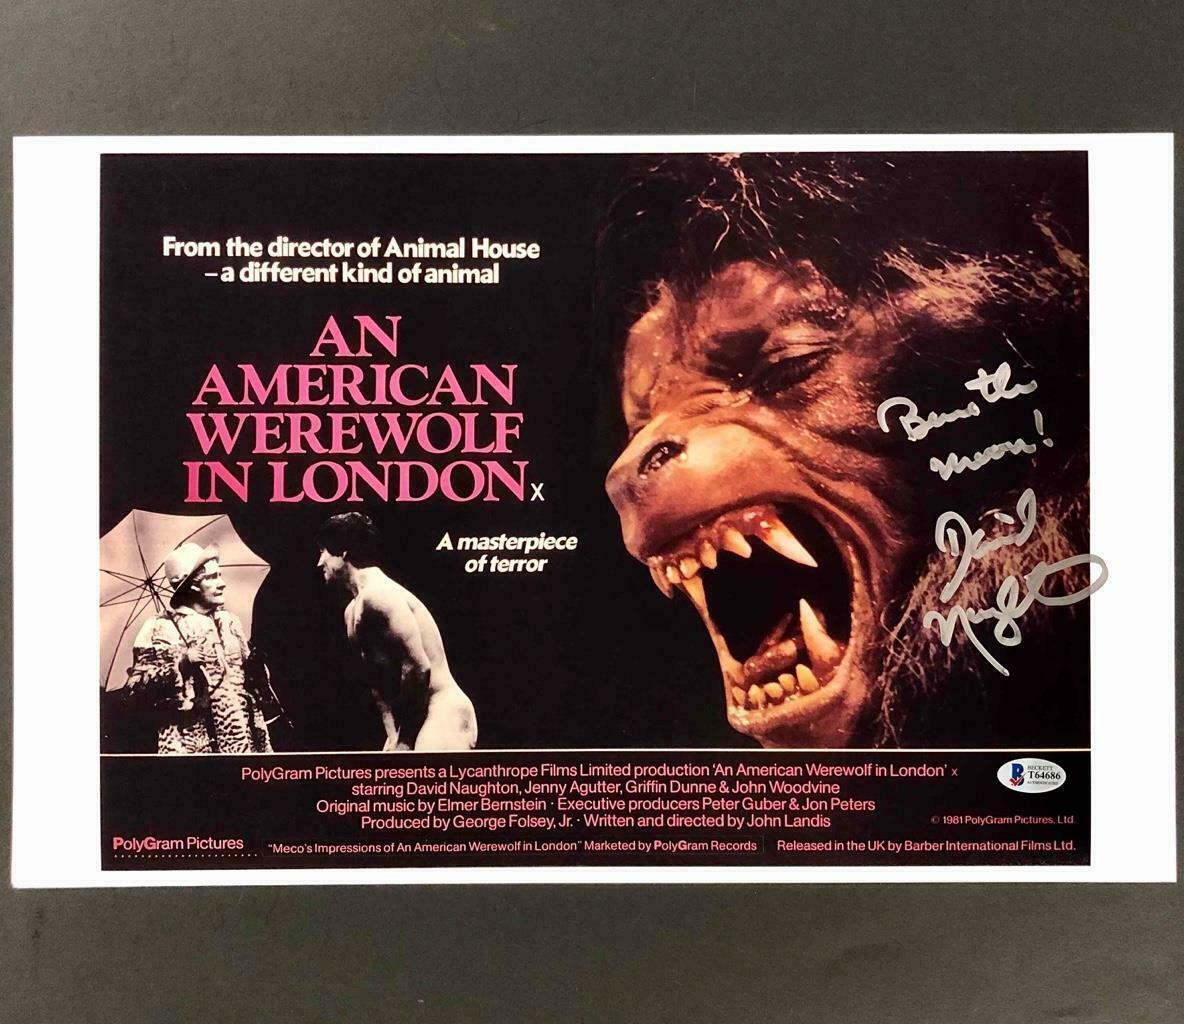 David Naughton Autograph 8x10 Photo An American Werewolf